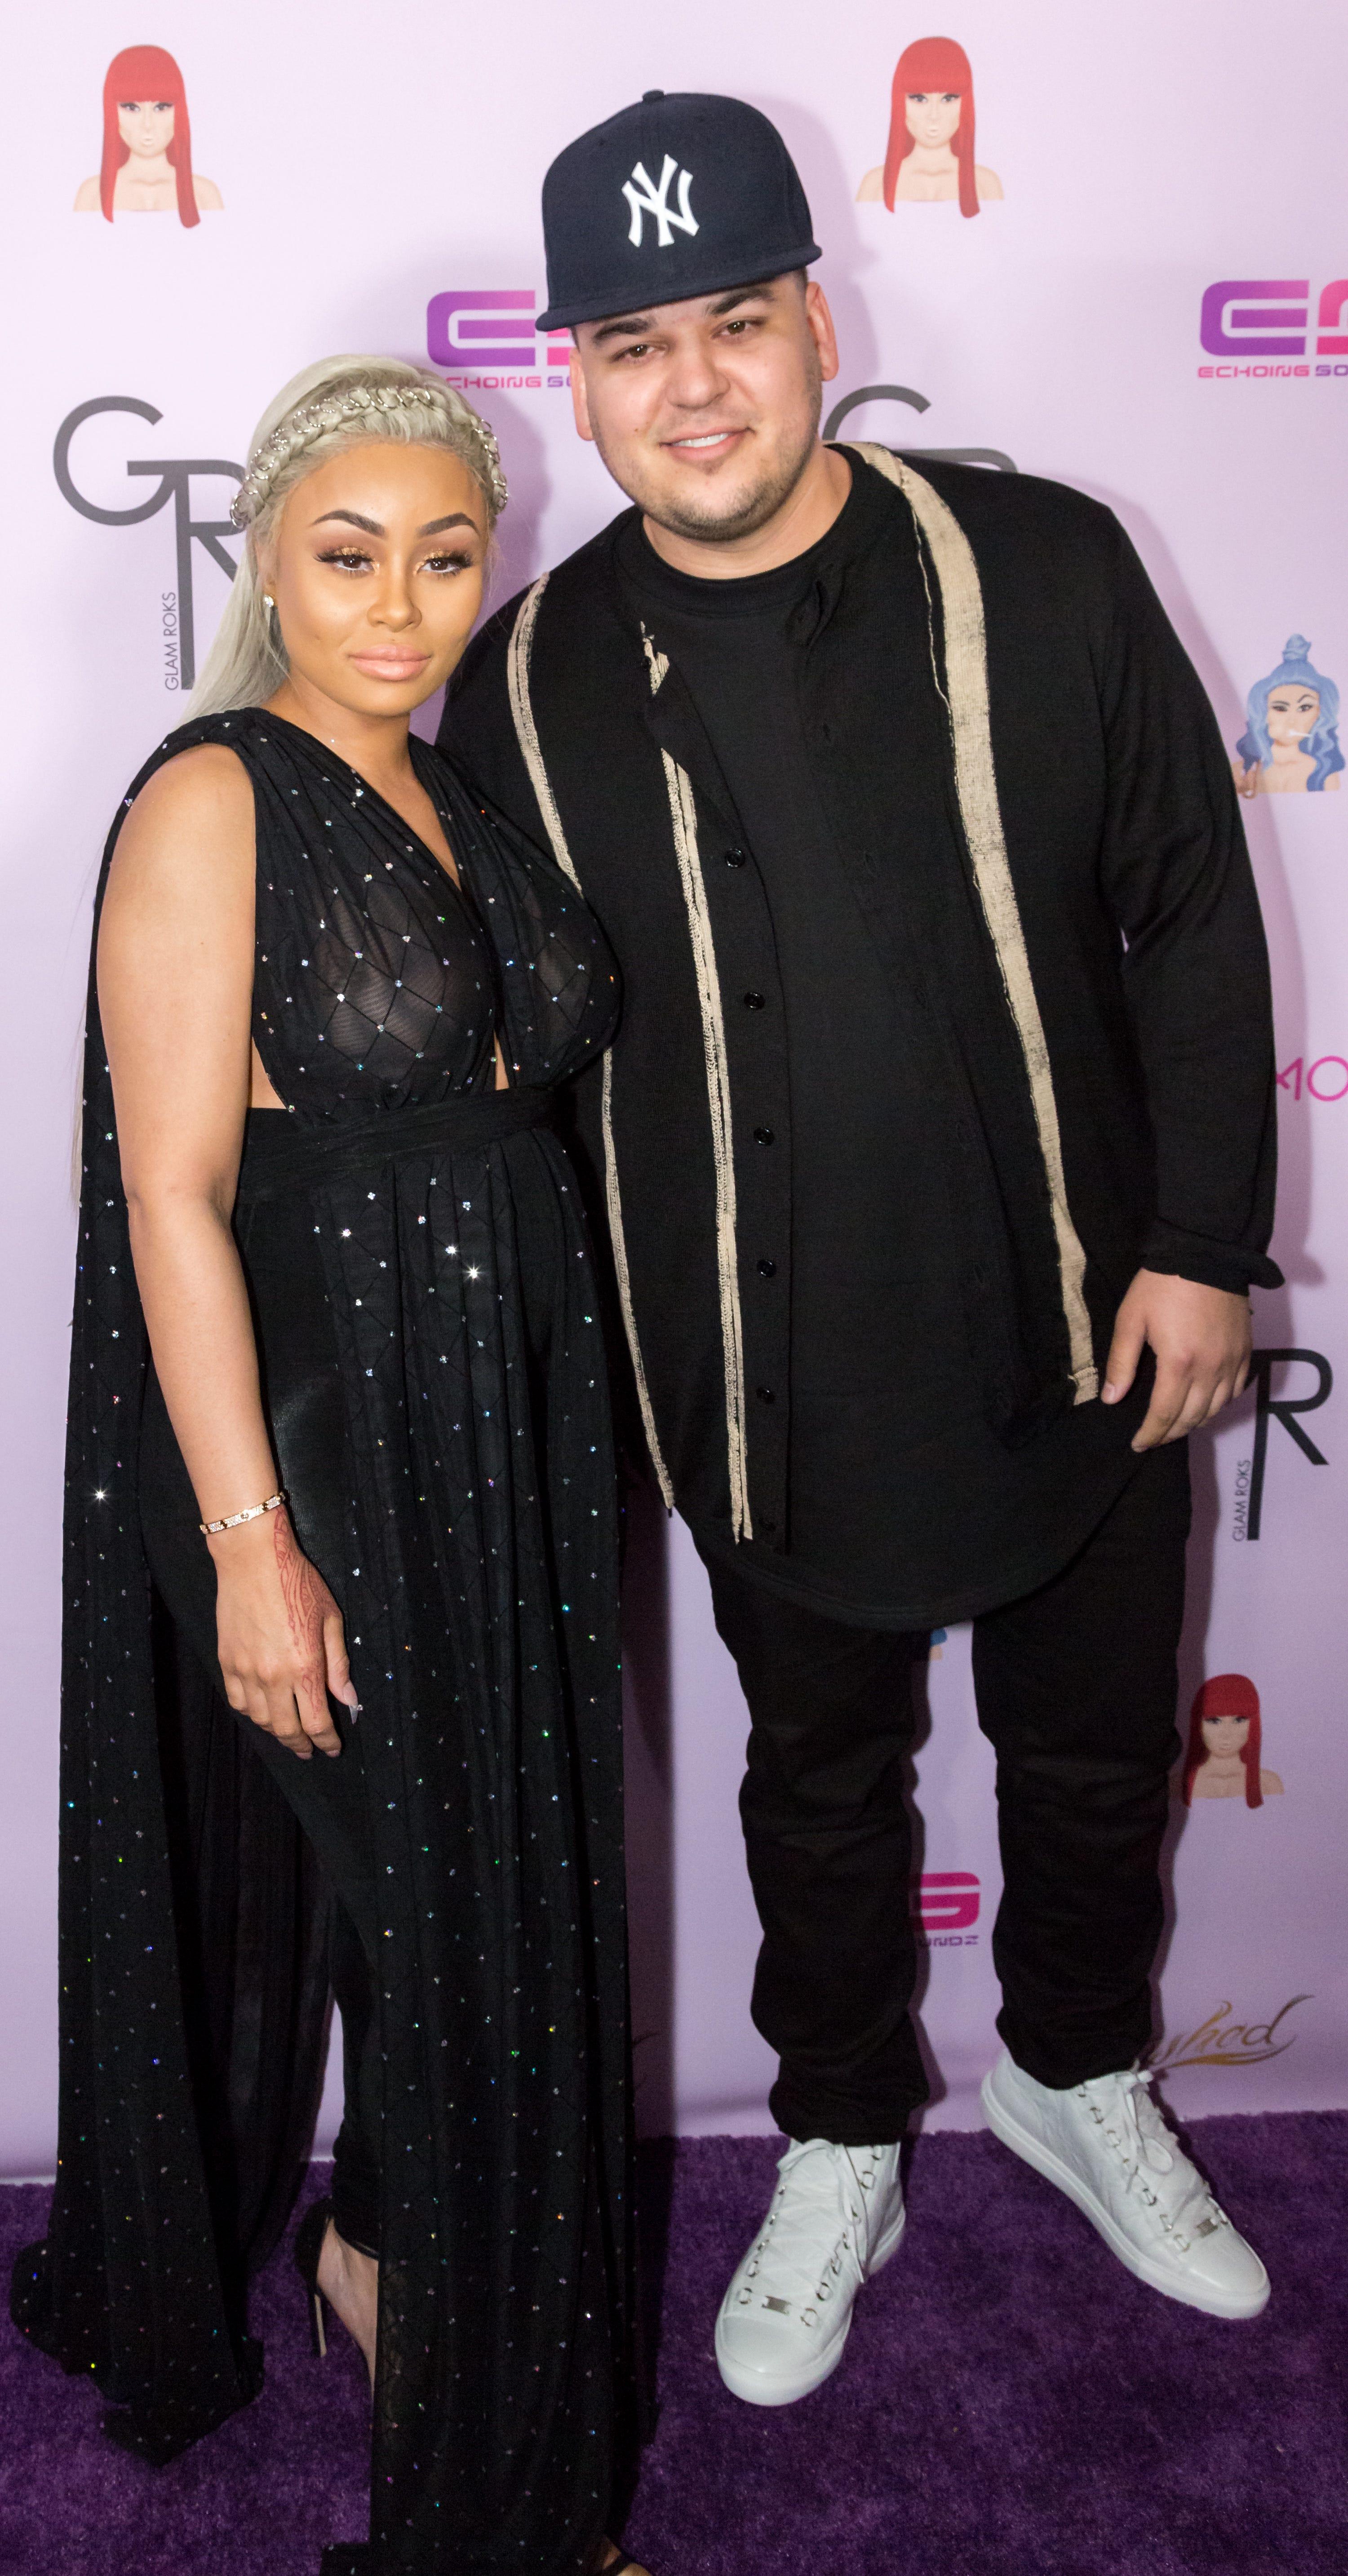 How Tall Are The Kardashians? Kim, Kylie, Khloe Height